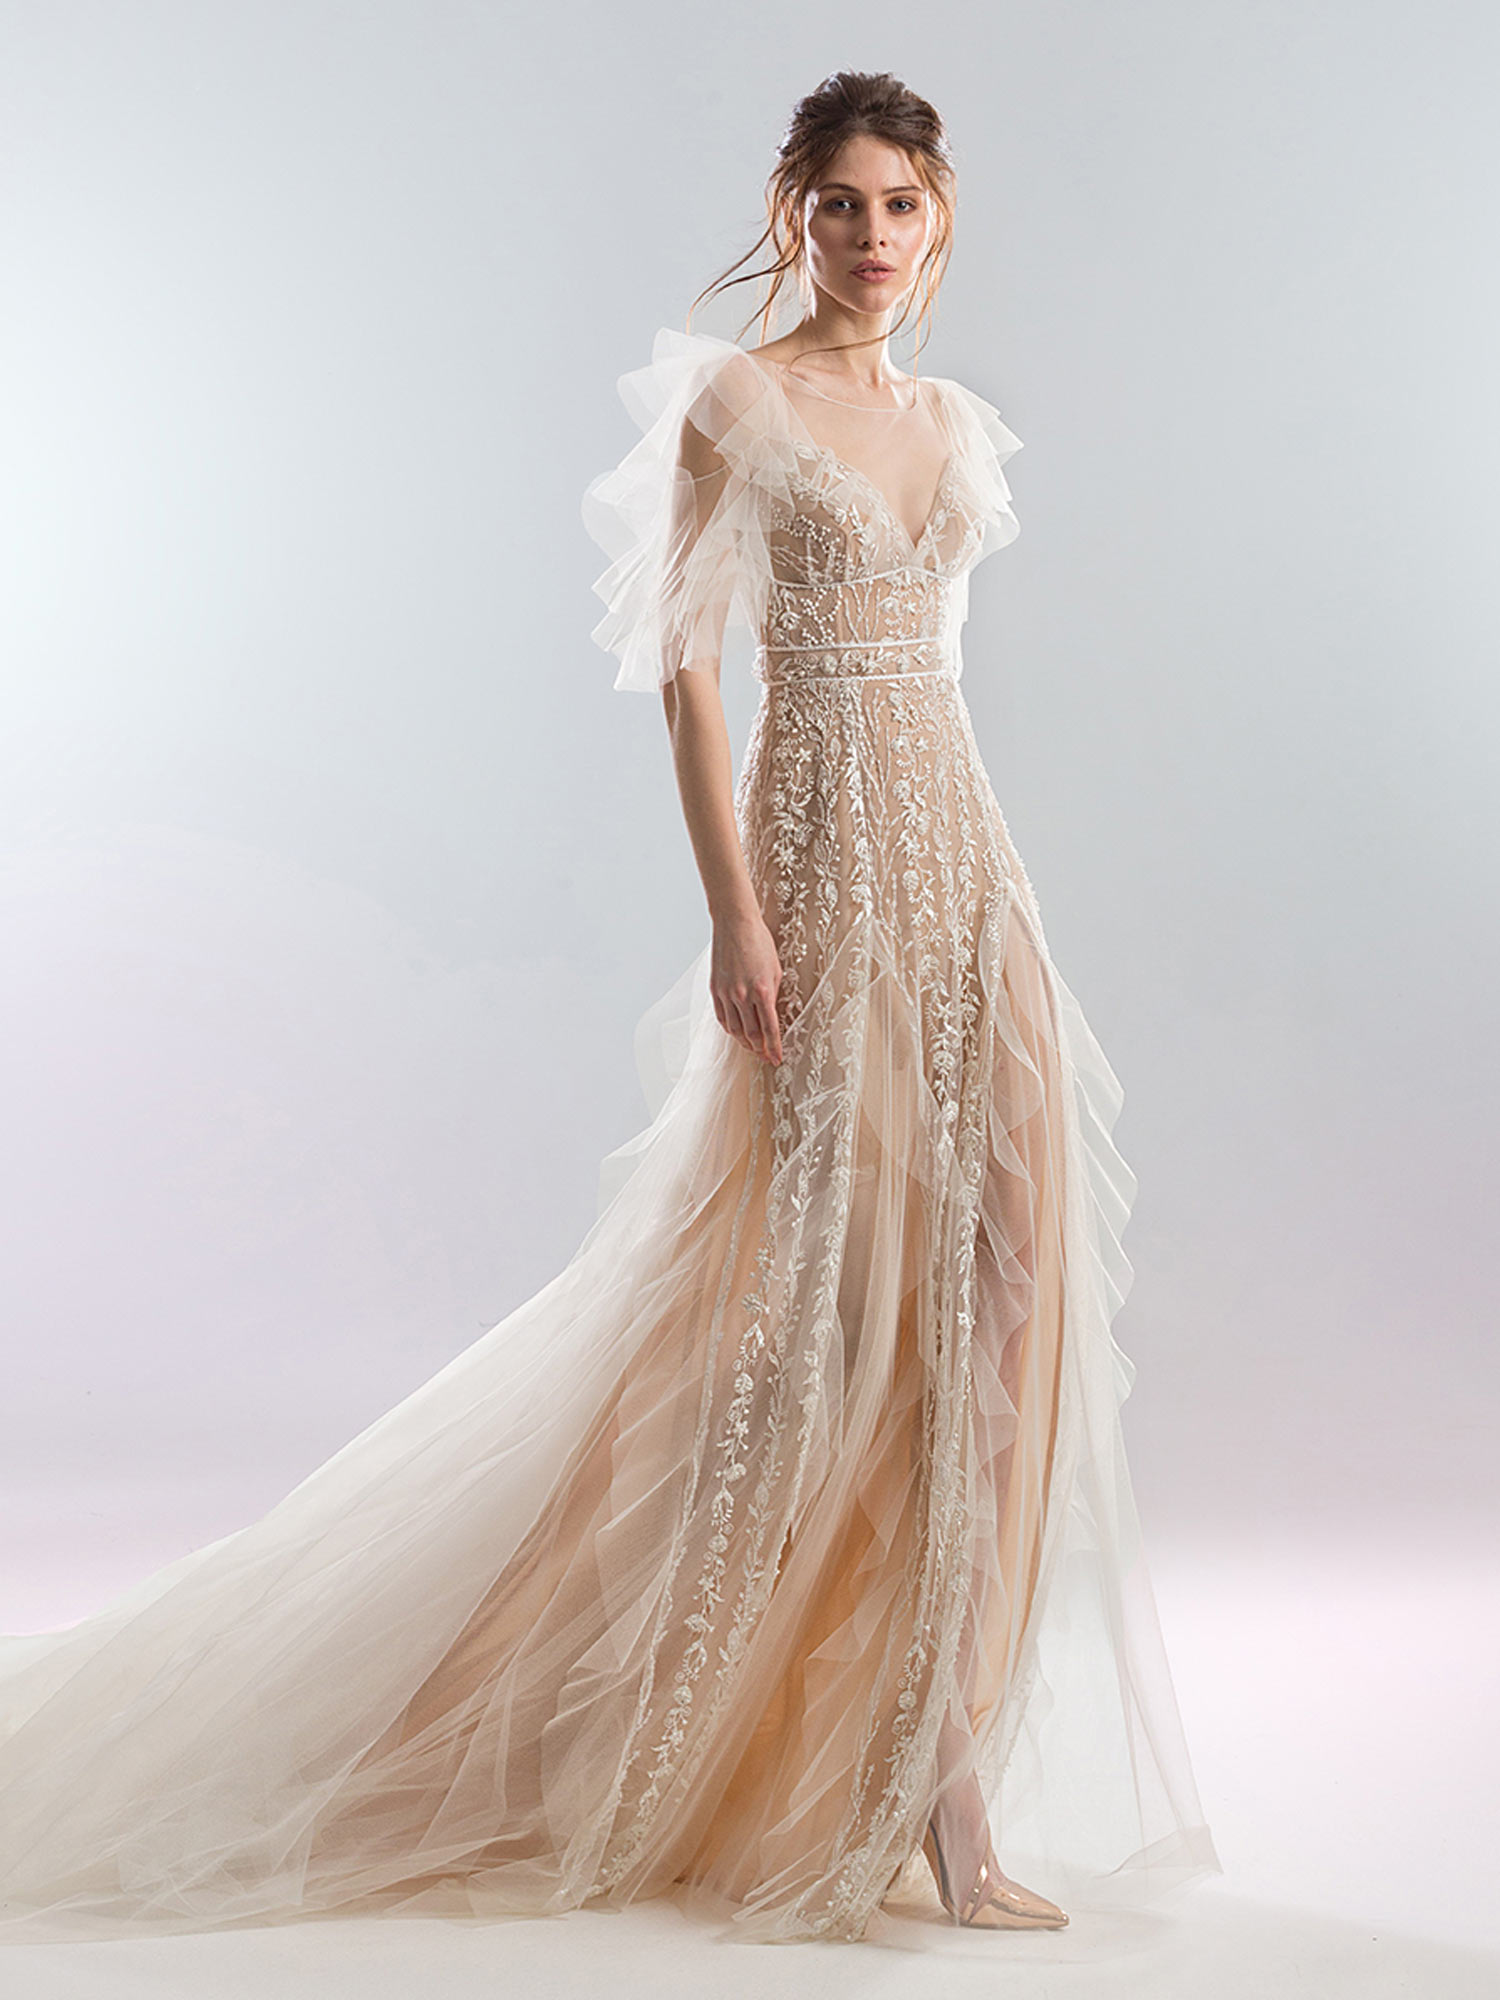 Sheath Wedding Dress.Ruffled Sheath Wedding Dress With Dramatic Sleeves And Floral Beading